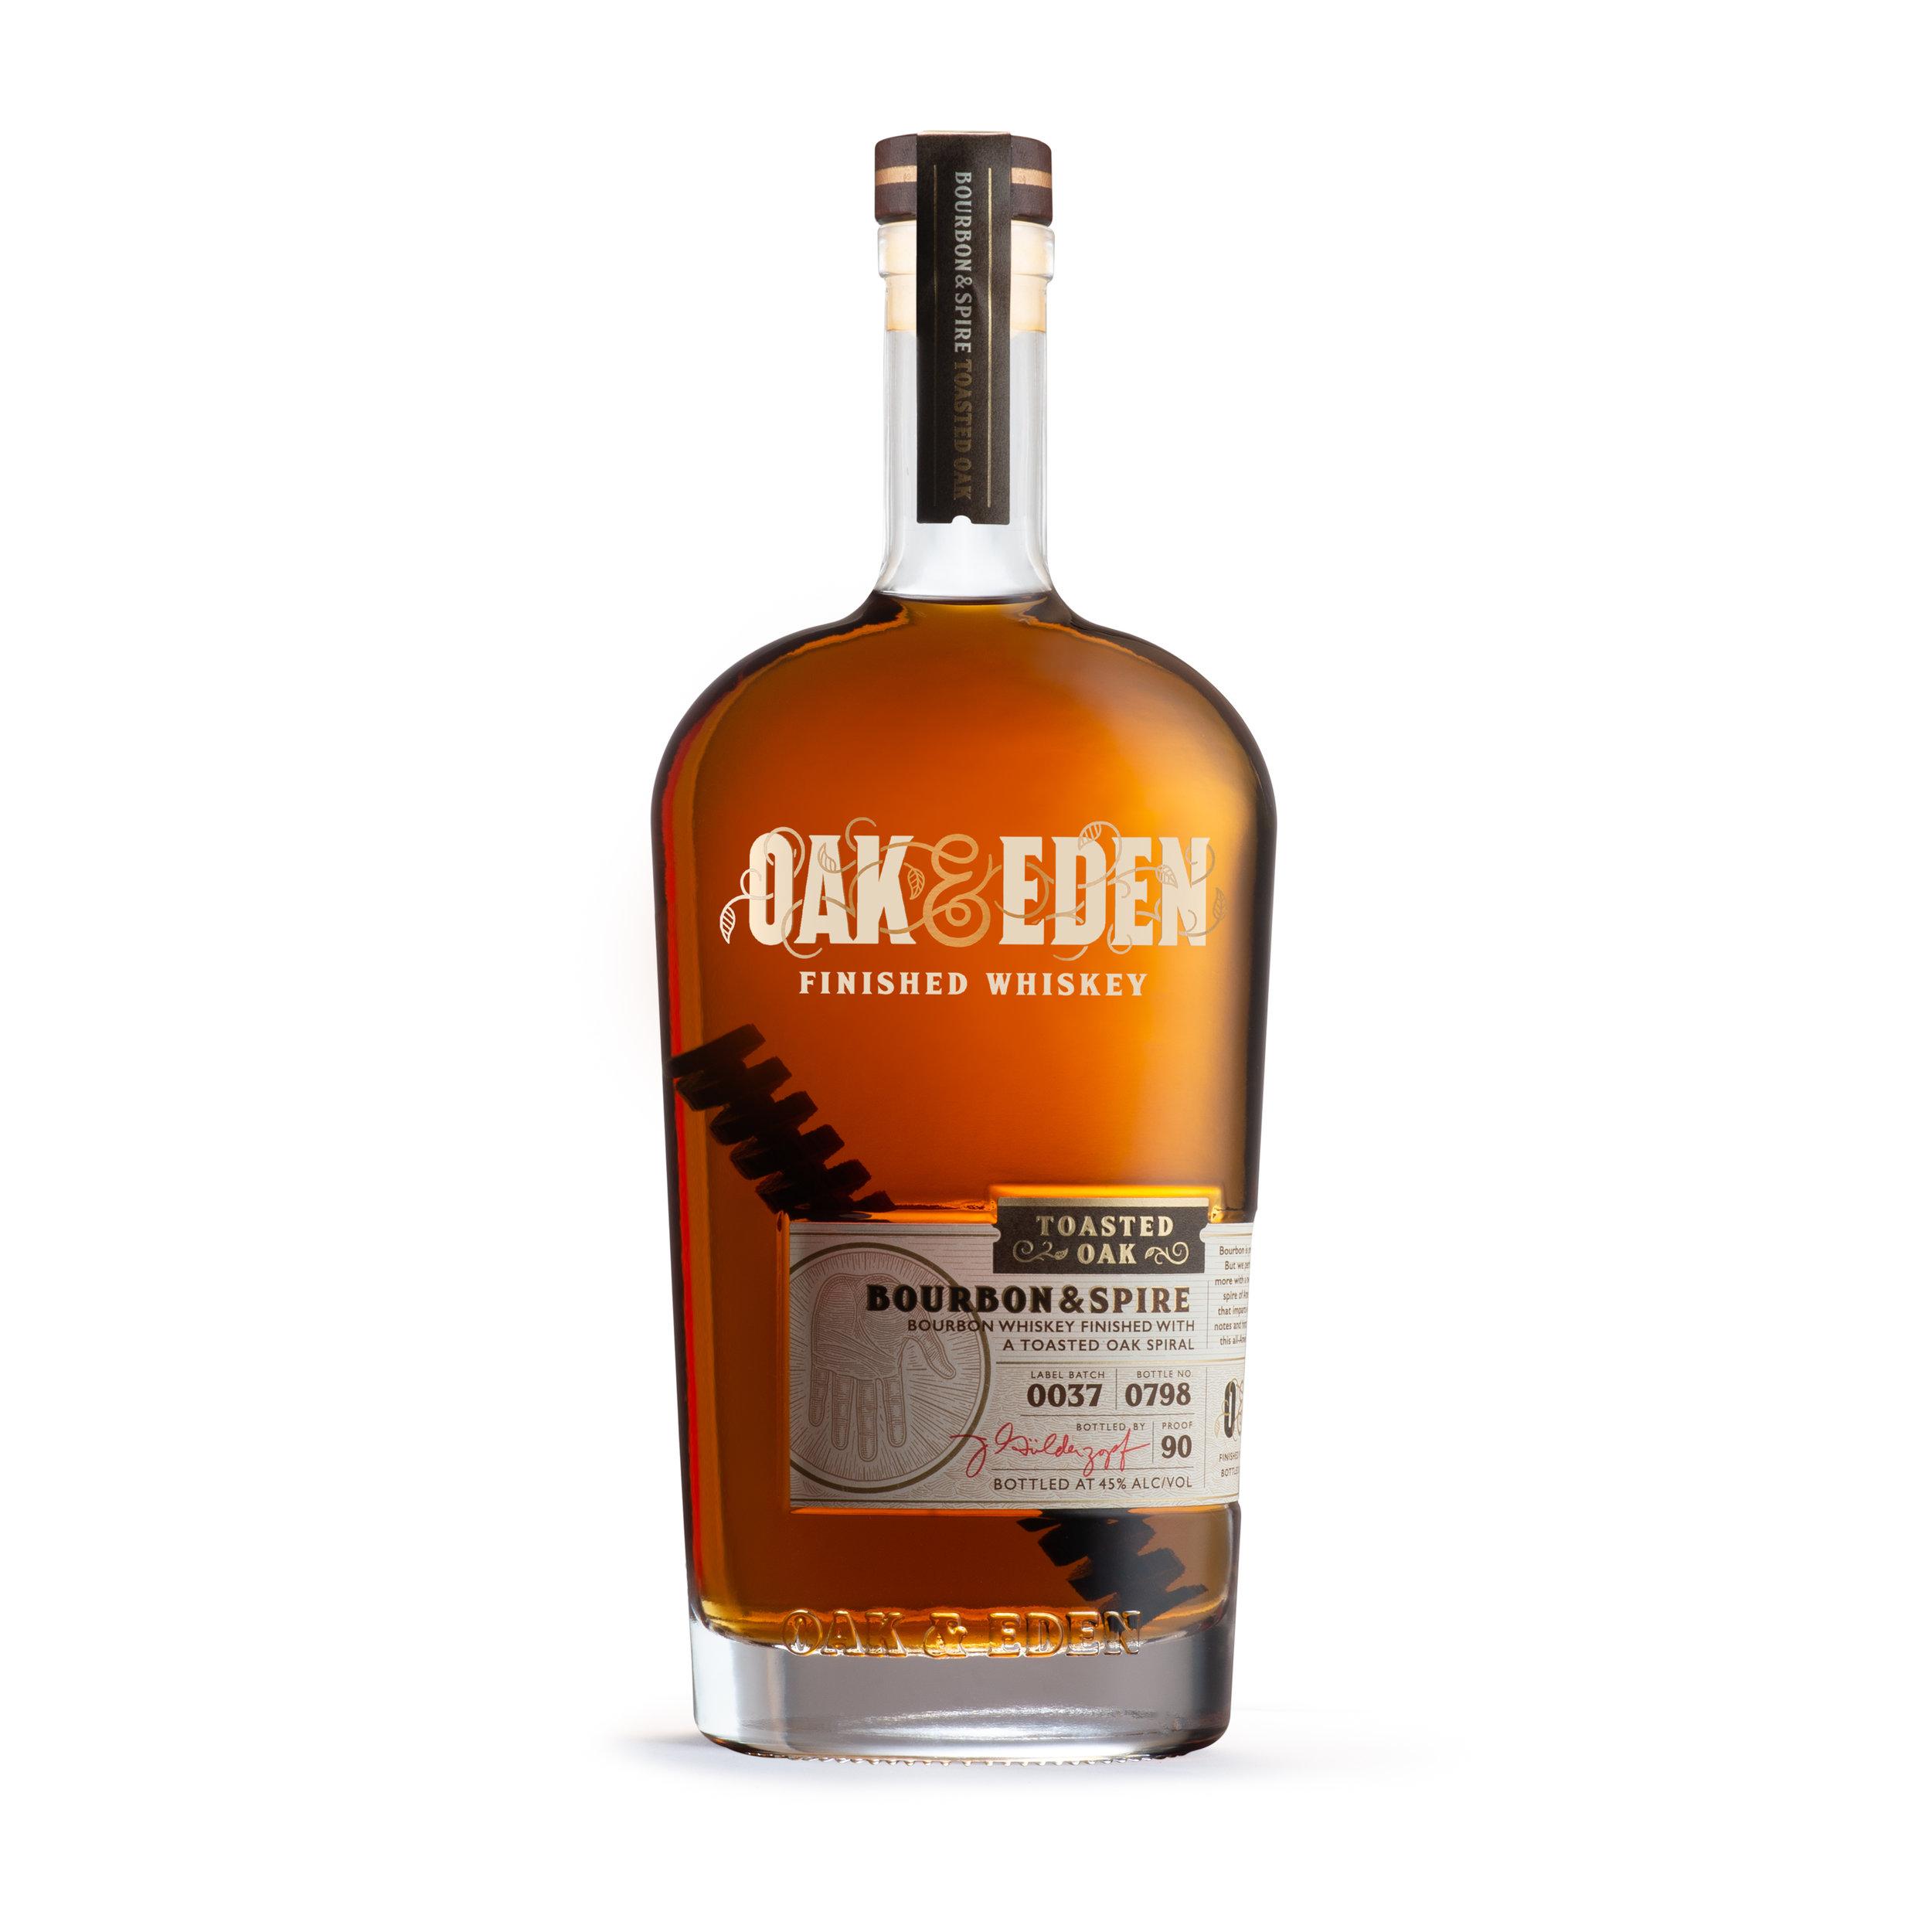 OAK-AND-EDEN-FINALS-005.jpg